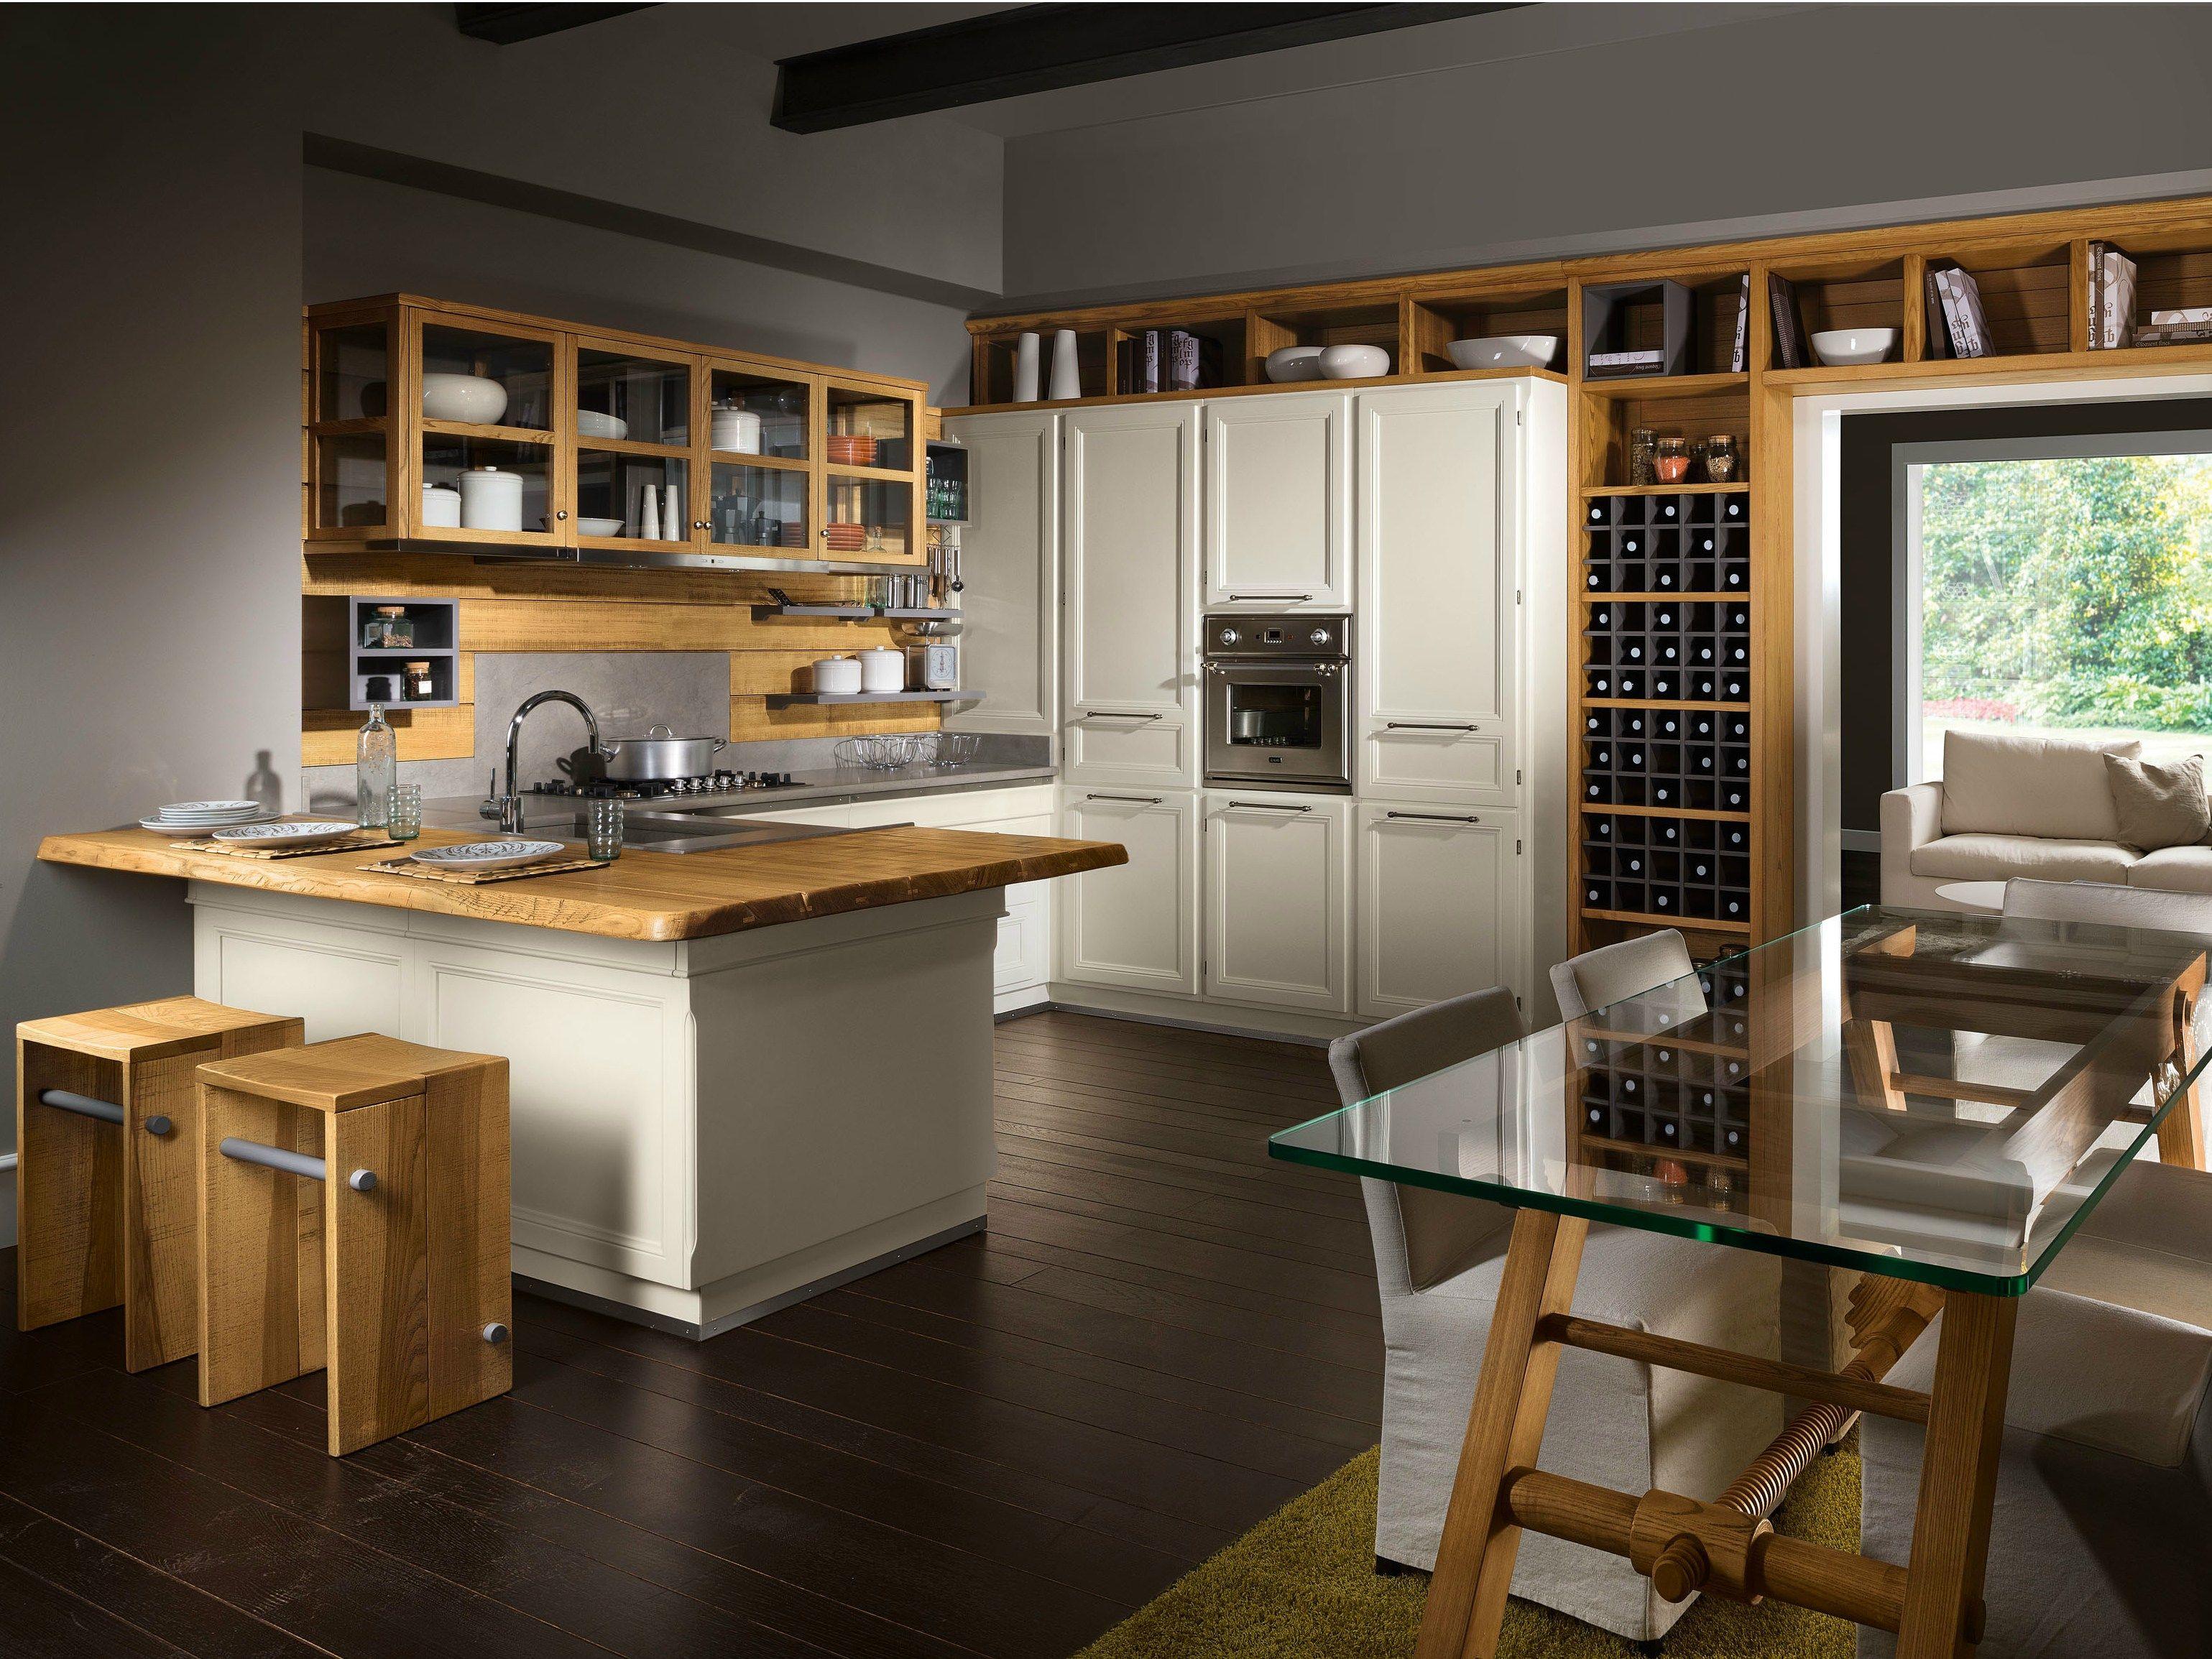 Complementi Cucine Cucine Stile Moderno Cucine Stile Moderno Cucine  #926A39 3078 2309 Foto Di Cucine In Pietra